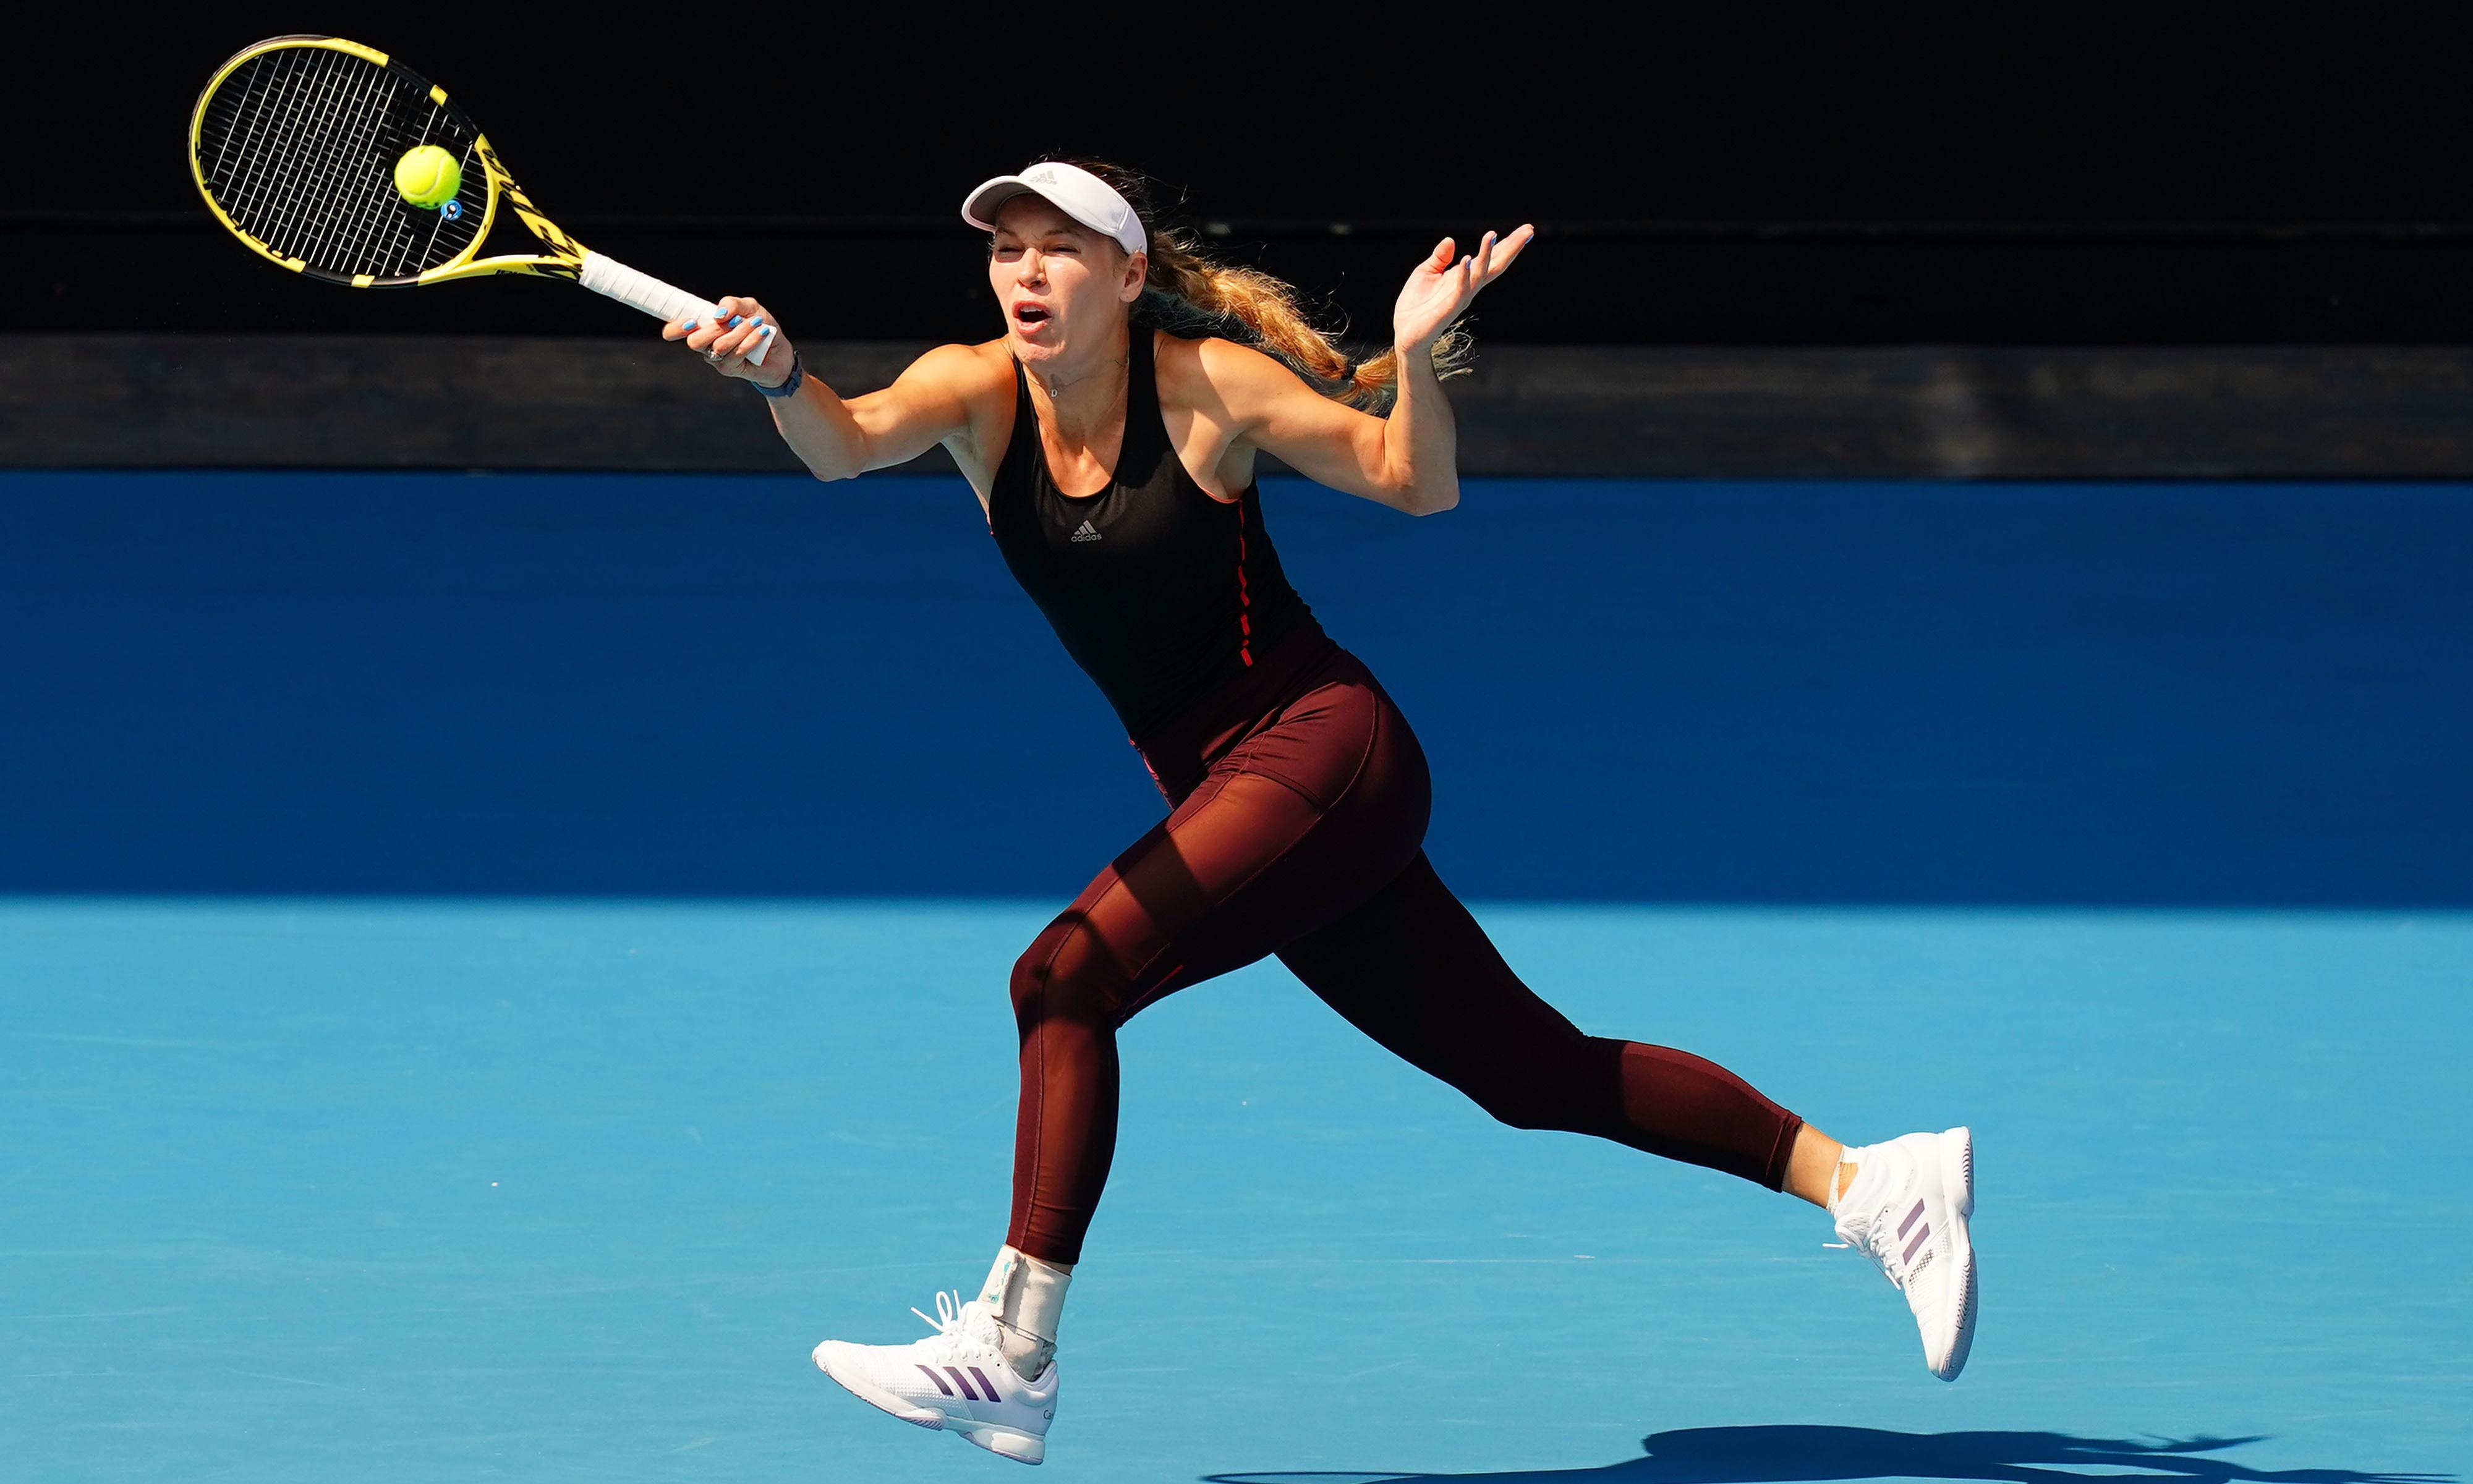 'It'll be emotional': Caroline Wozniacki braced for farewell at Australian Open